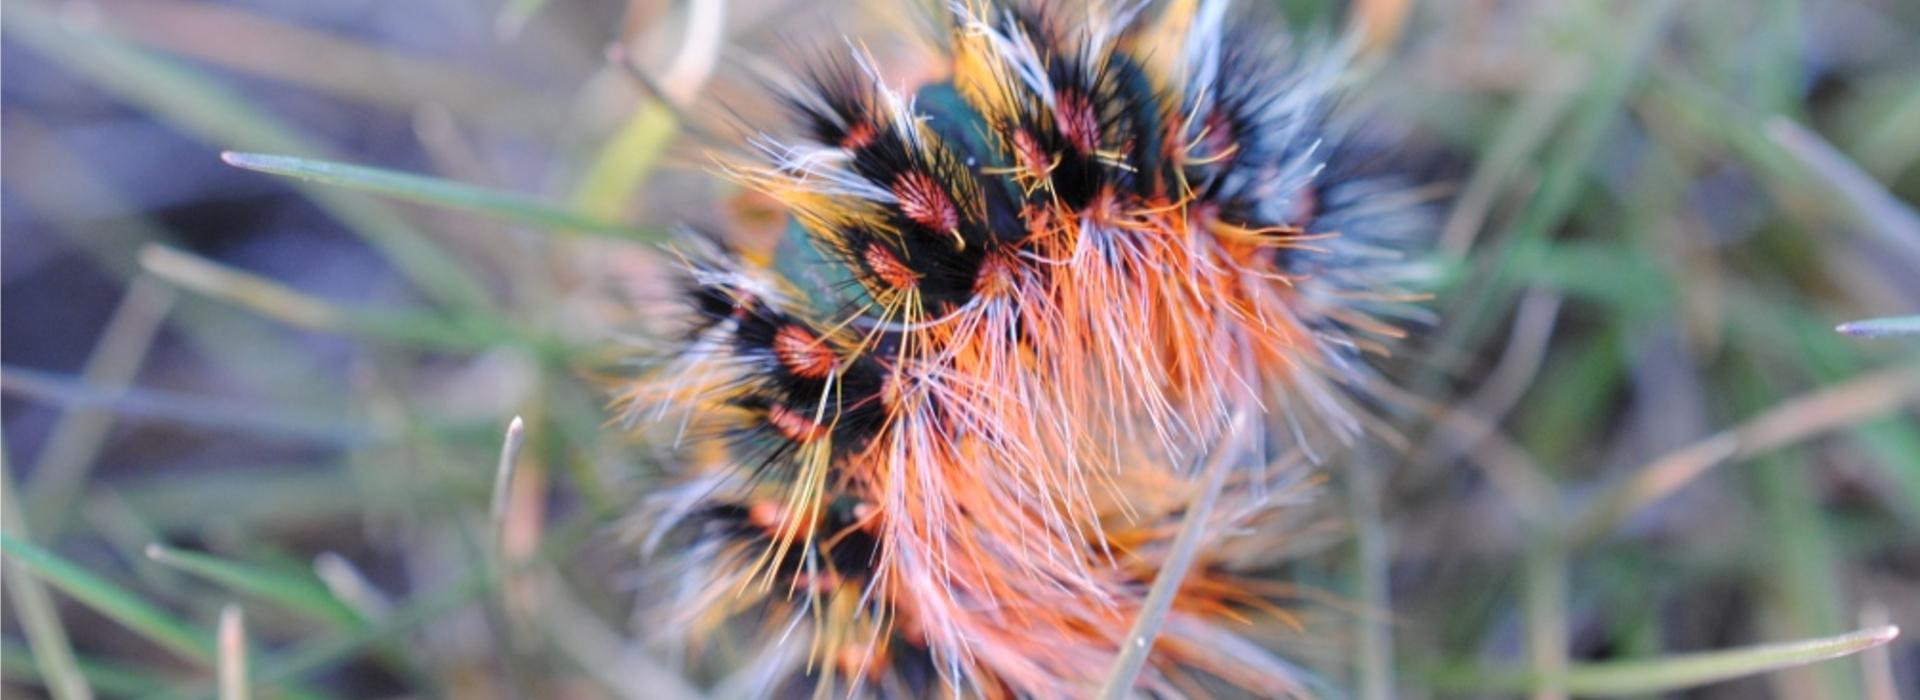 Oruga de la polilla endémica Chondrostega vandalicia